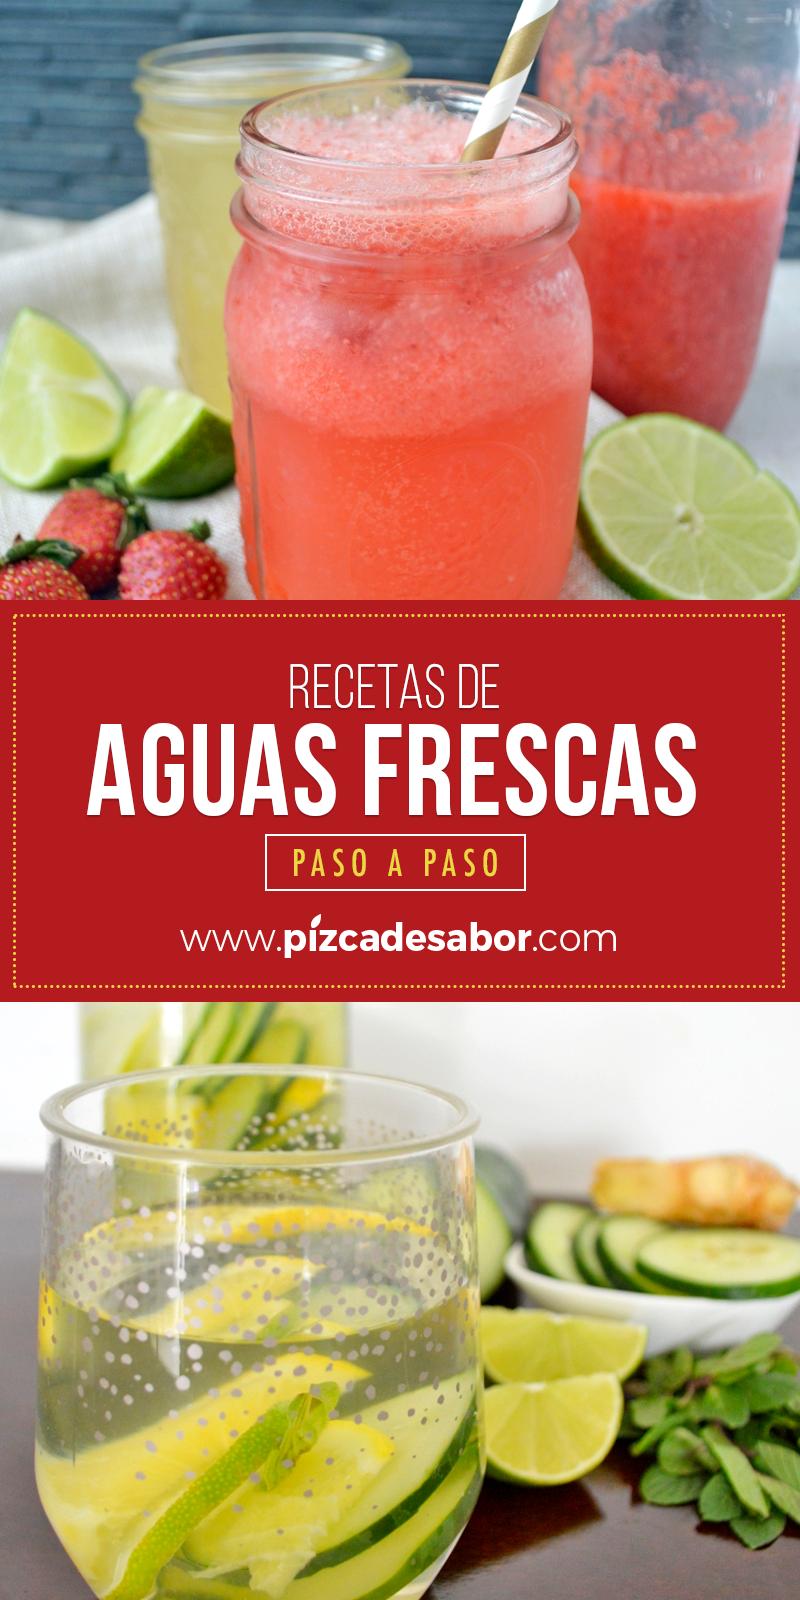 Recetas De Aguas Frescas Paso A Paso Aguas Frescas Recetas Recetas De Agua Agua De Frutas Recetas